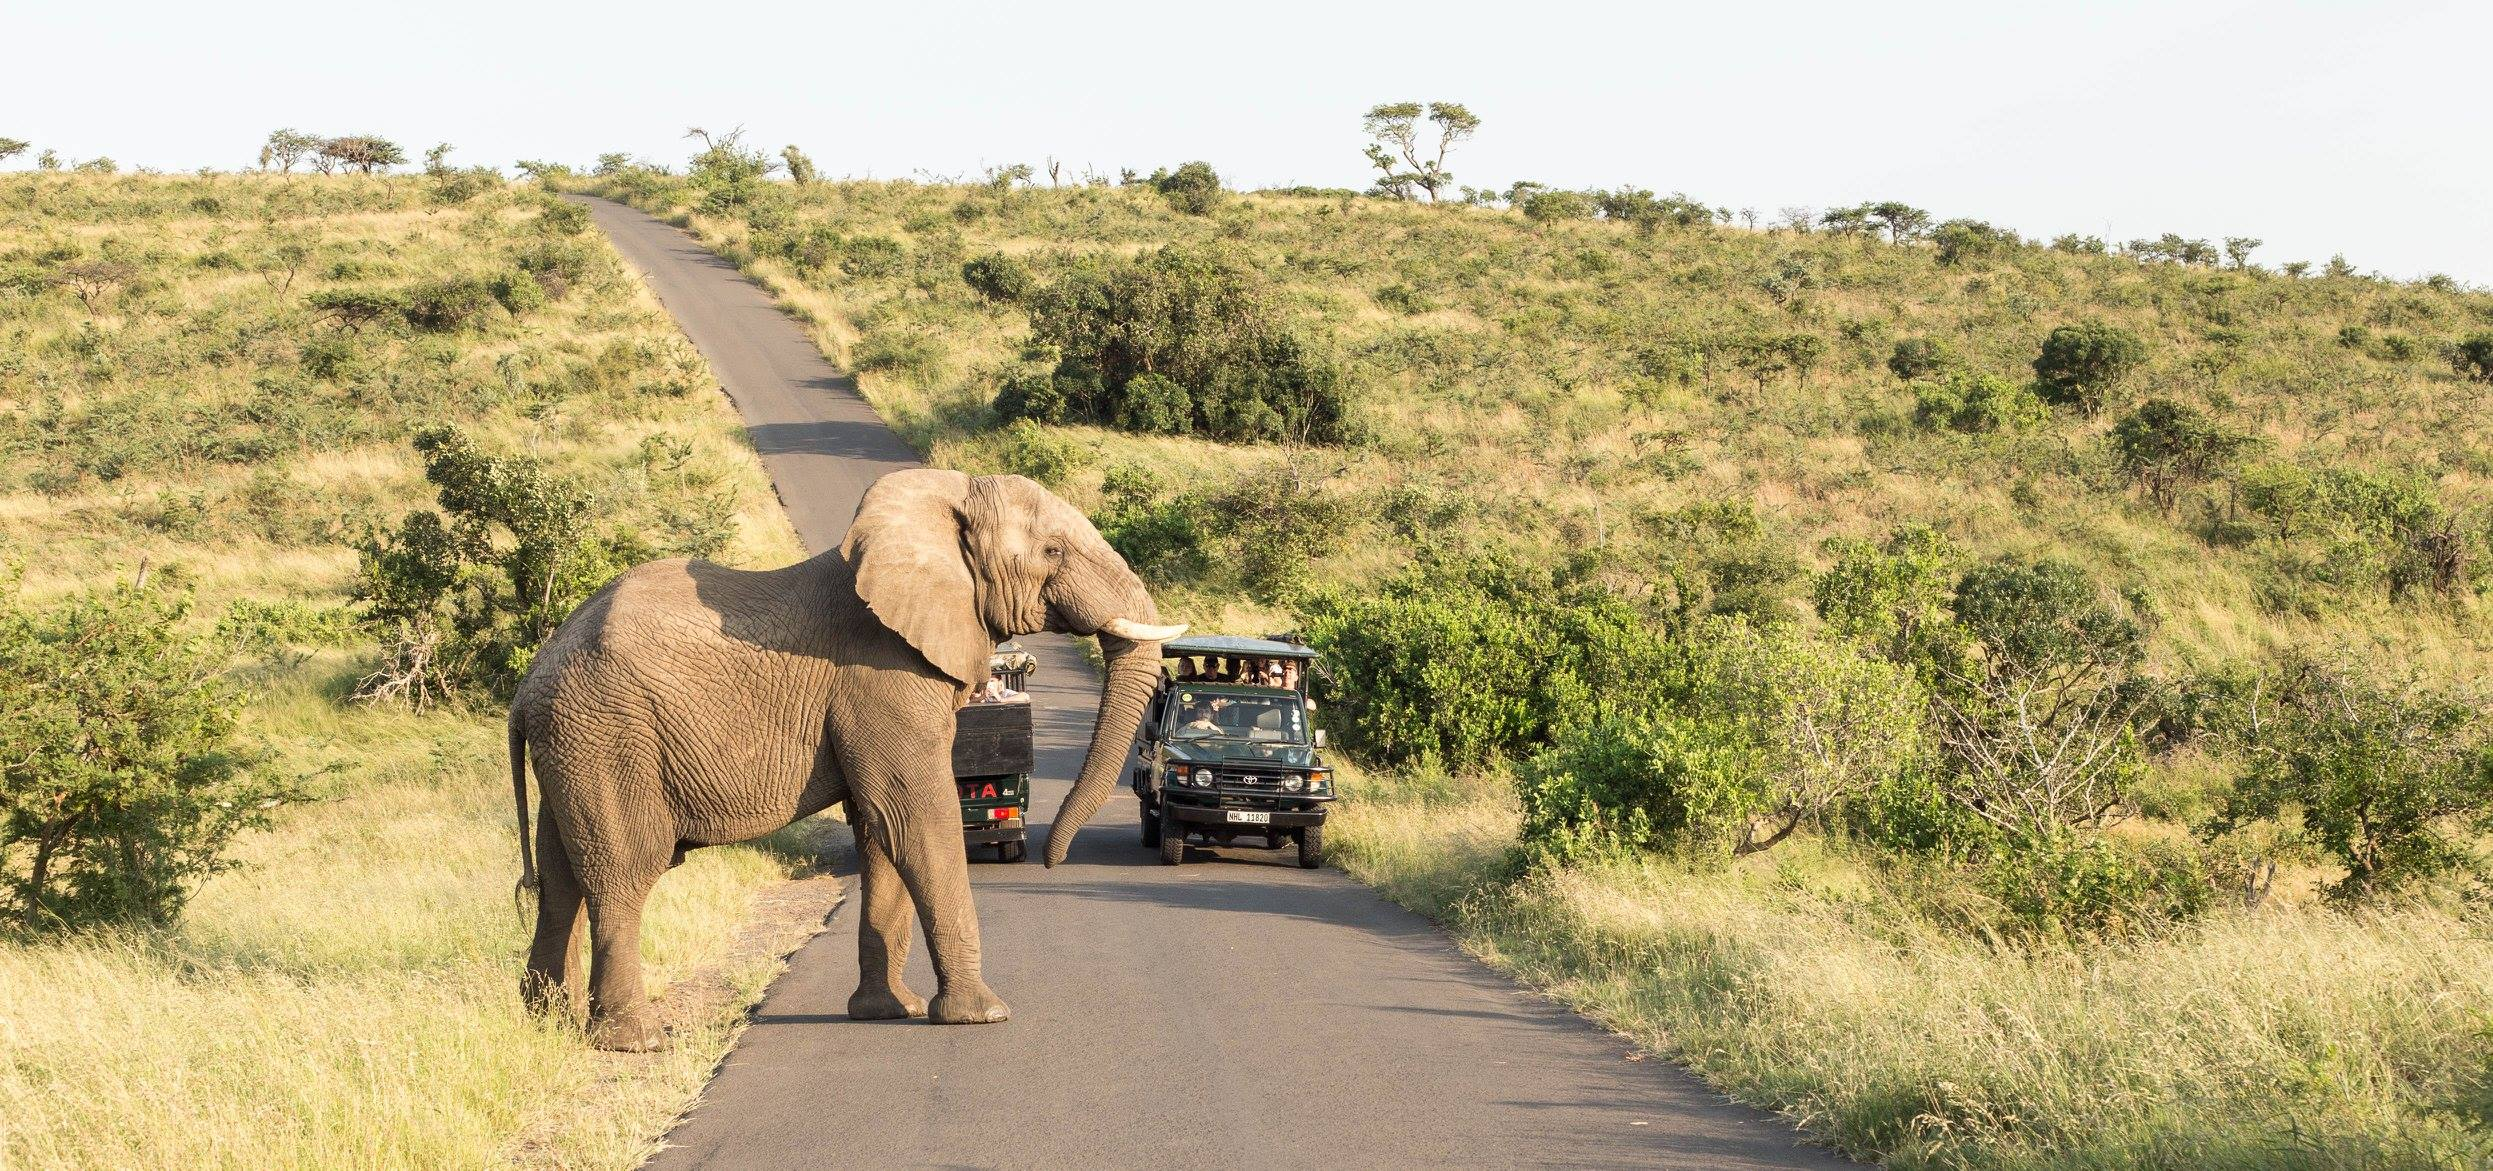 Hluhluwe Big 5 Safaris Top Things to Do in South Africa